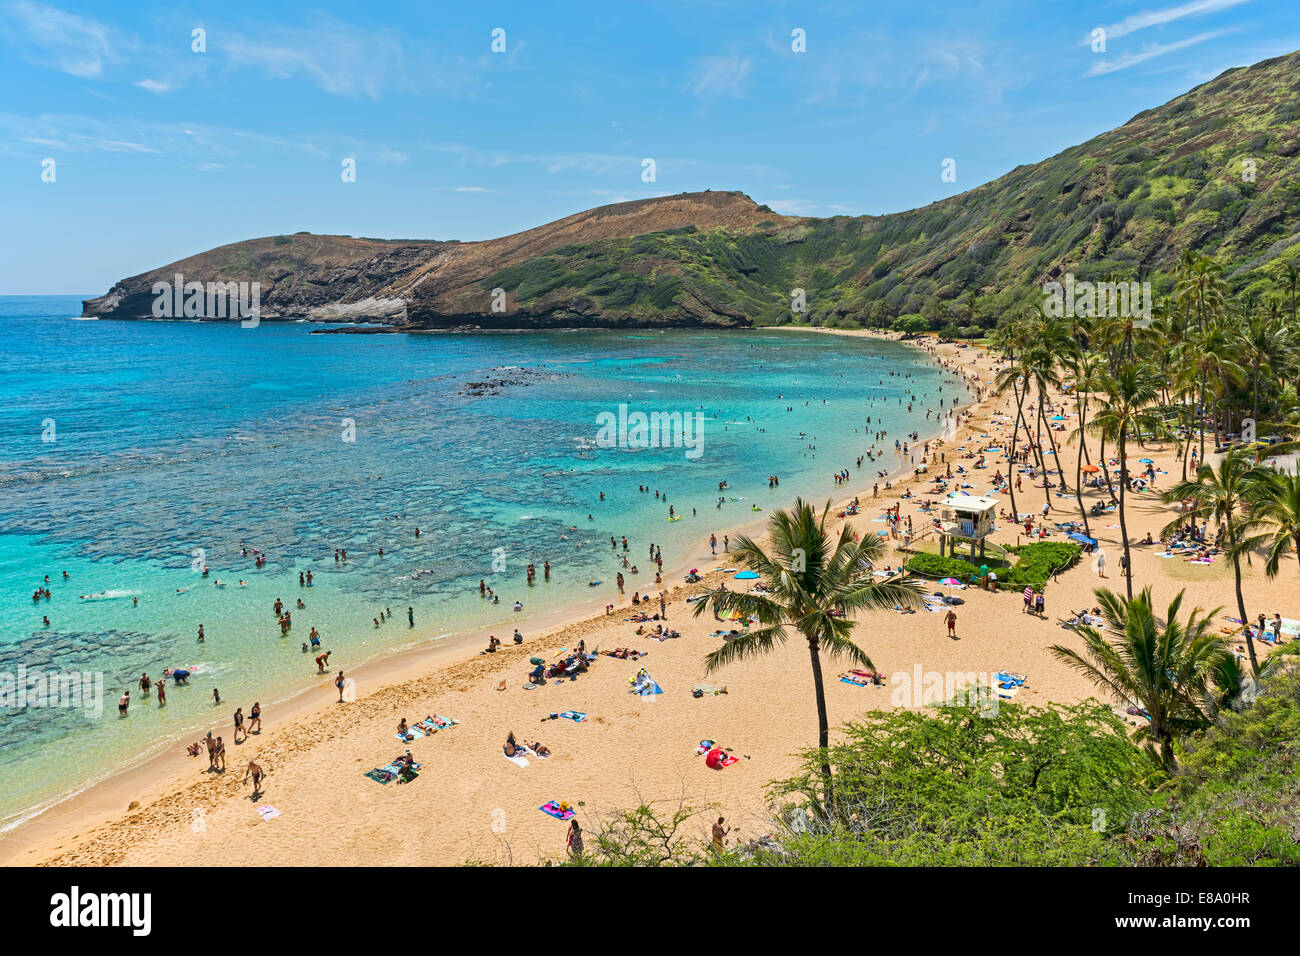 Beach, Hanauma Bay, Oahu, Hawaii, United States - Stock Image